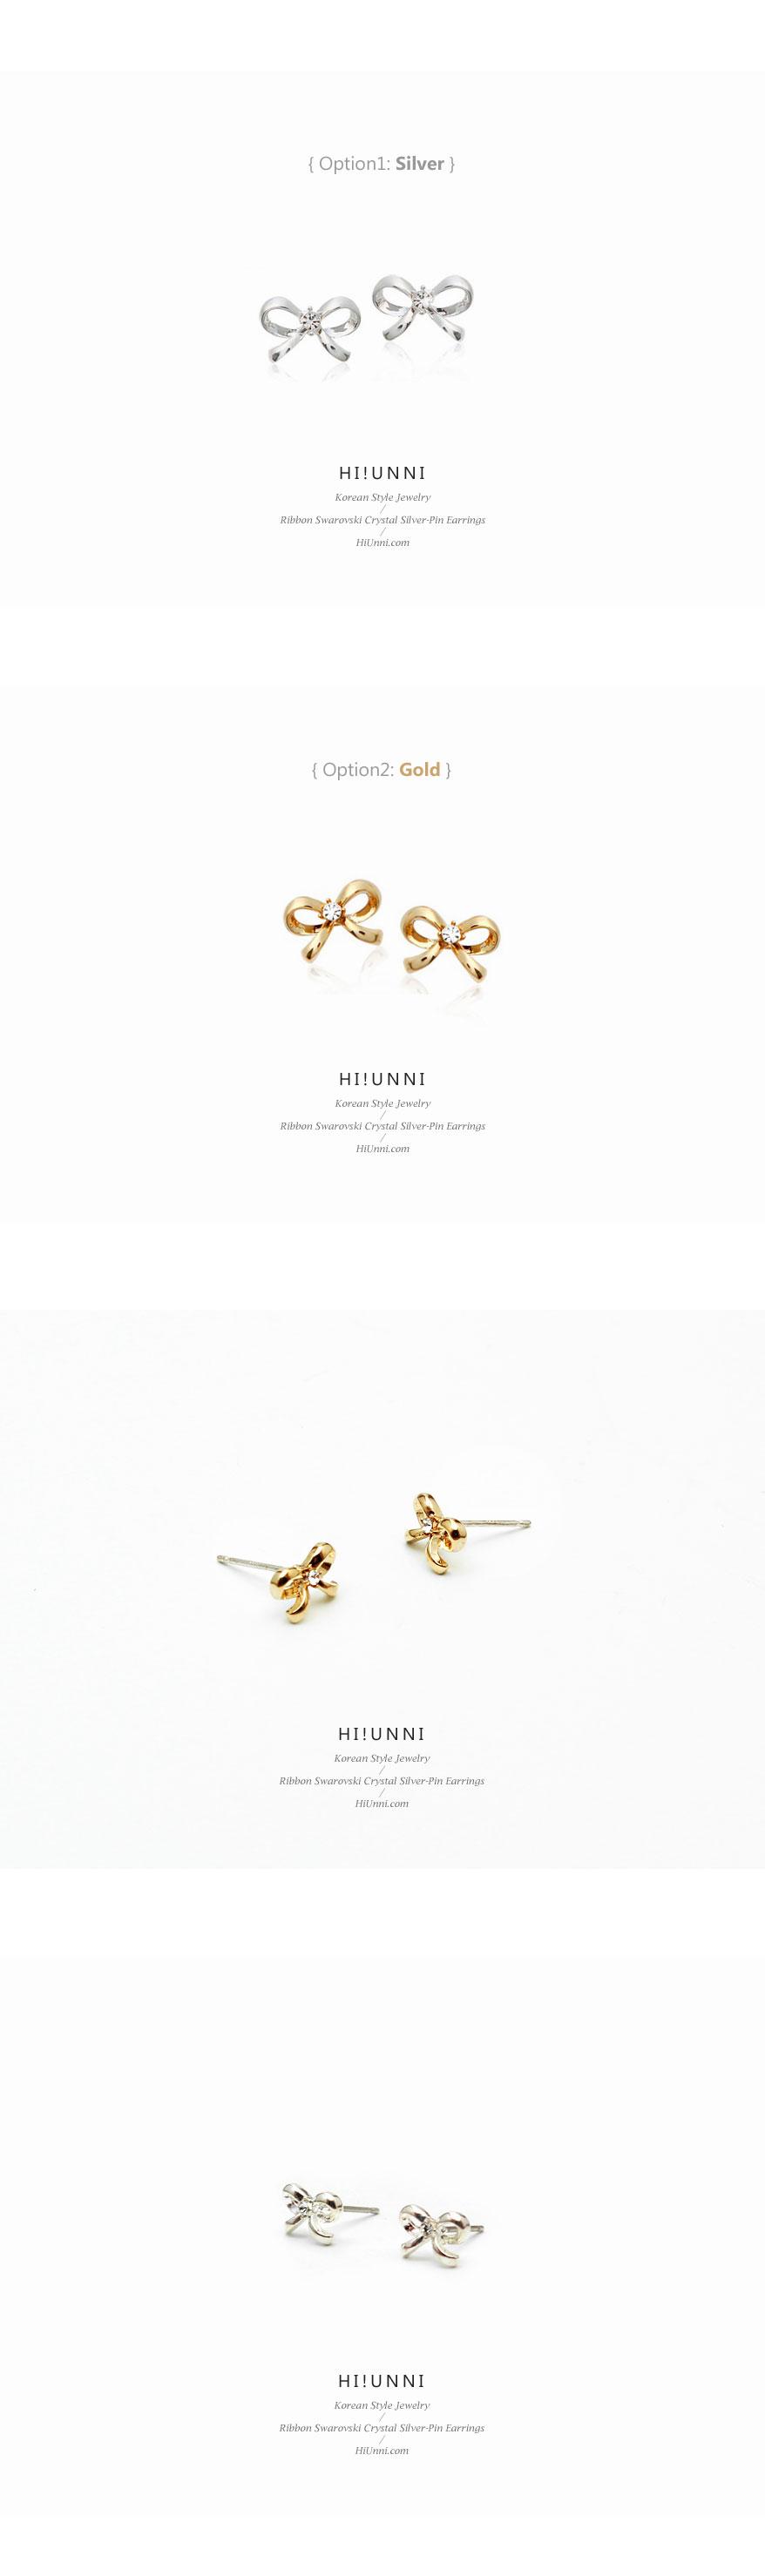 accessories_ear_stud_earrings_korean_asian_style_jewelry_Nickel-Free_titanium_swarovski_crystal_ribbon_925_silver_2